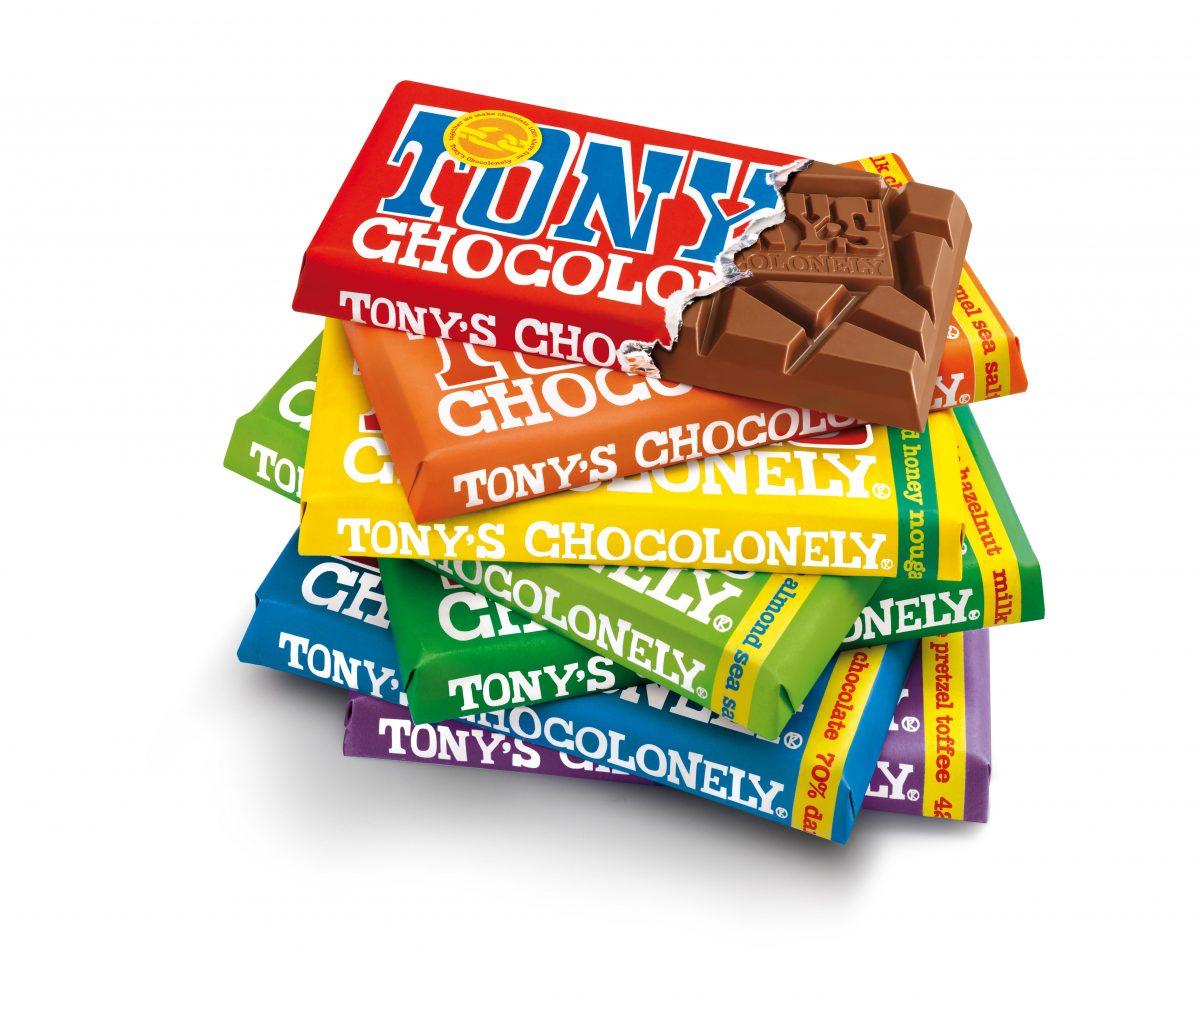 new chocolate bars, tony's chocolonely